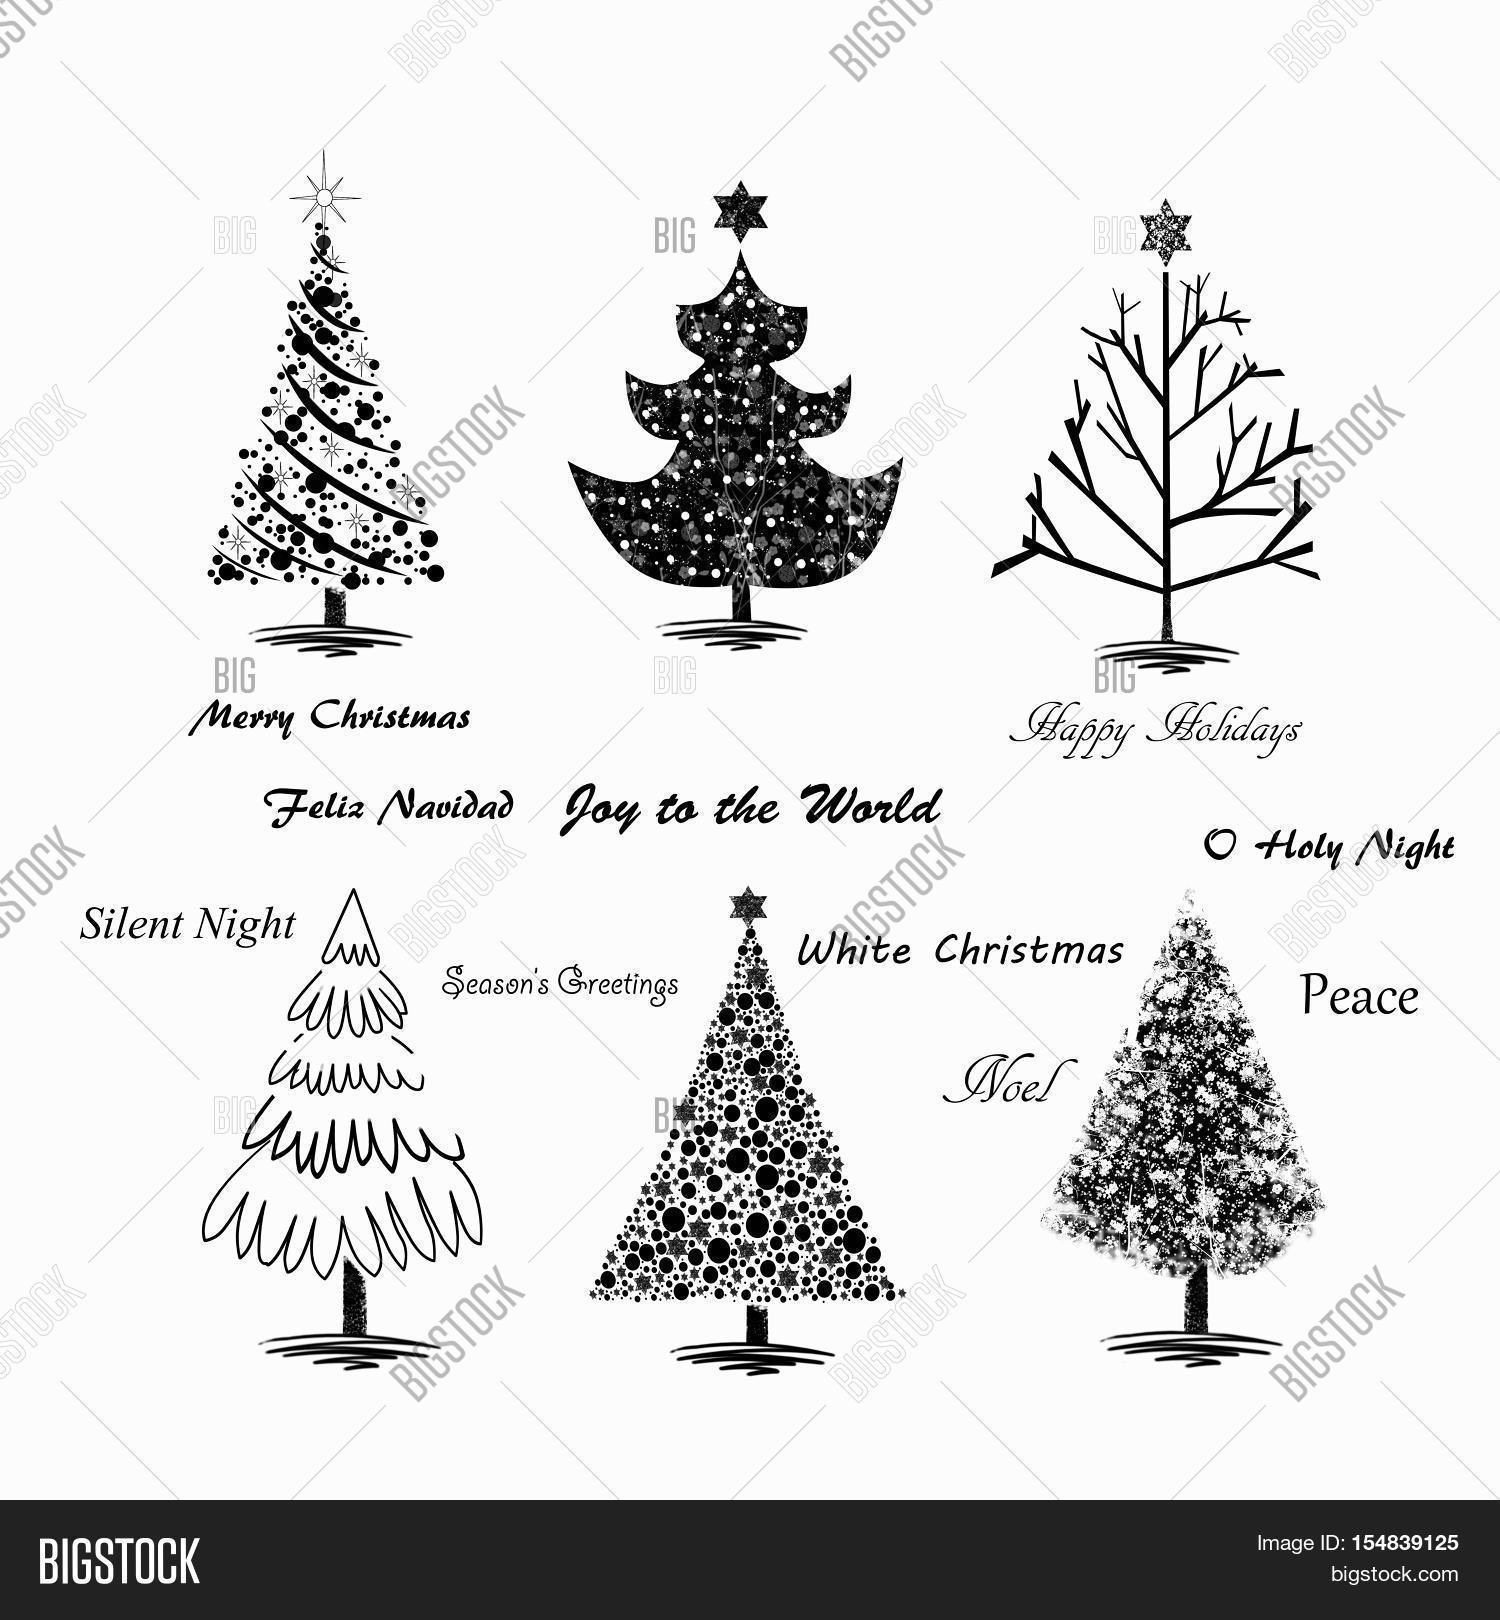 Hand Drawn Christmas Image & Photo (Free Trial) | Bigstock